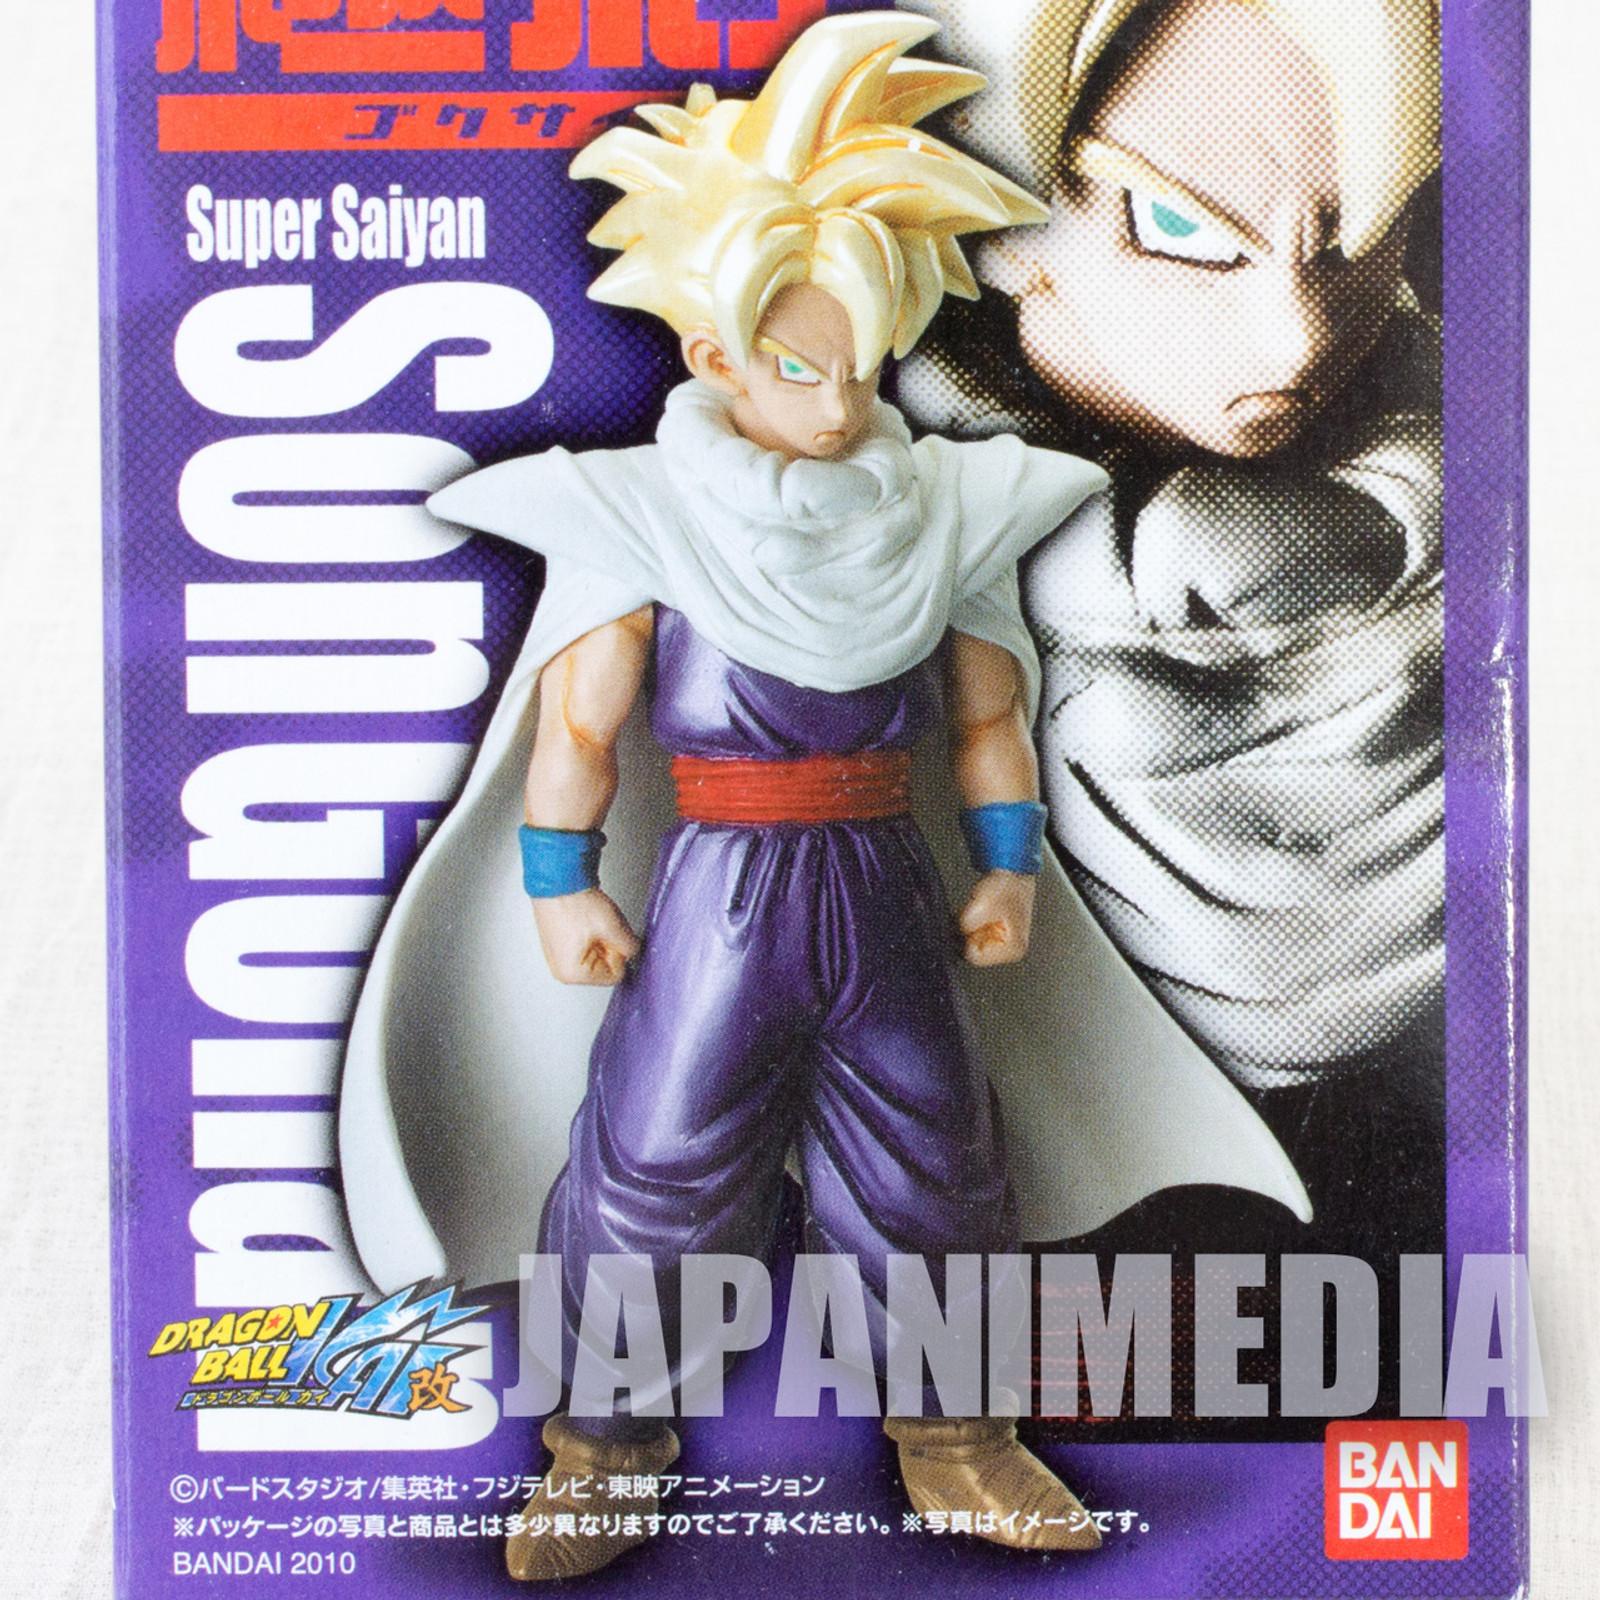 Dragon Ball Z Super Saiyan Gohan Figure Gokusai Series BANDAI JAPAN ANIME